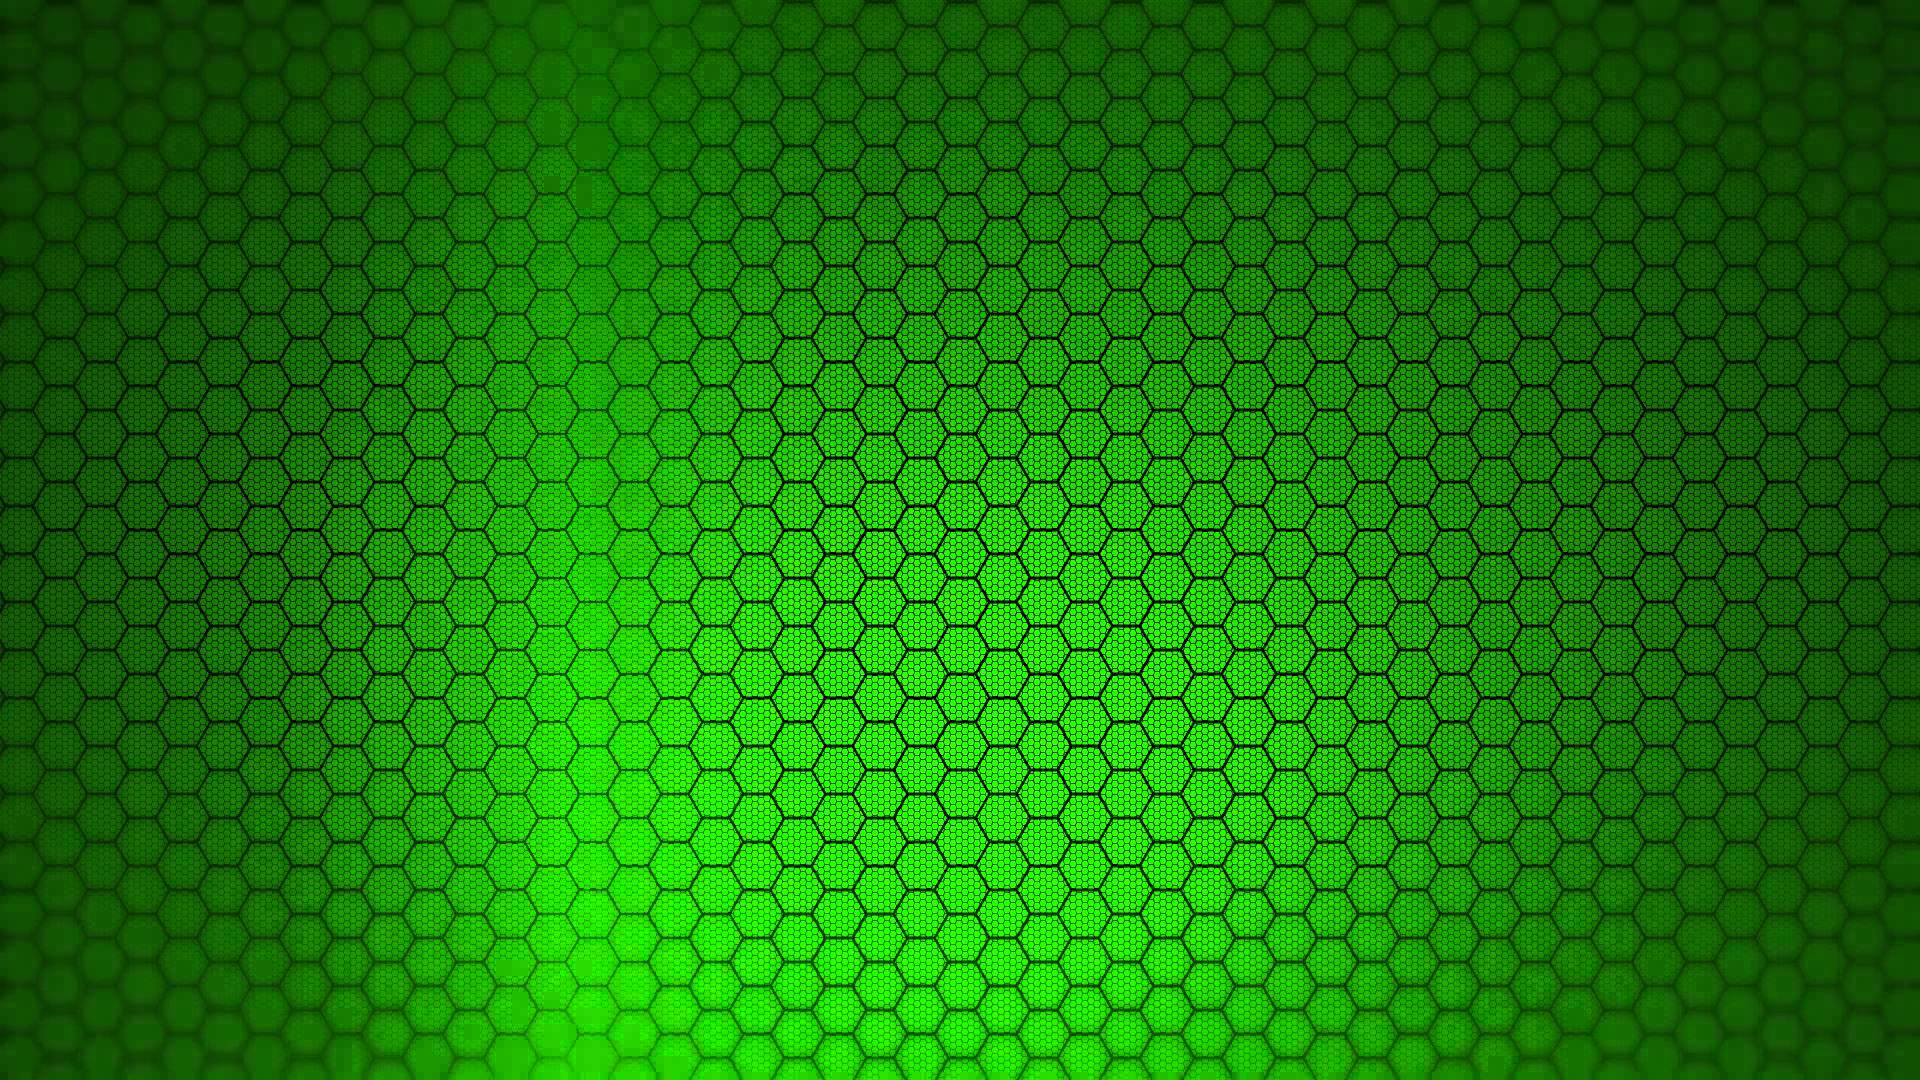 Hexagon Background   Green Screen Animation 1920x1080